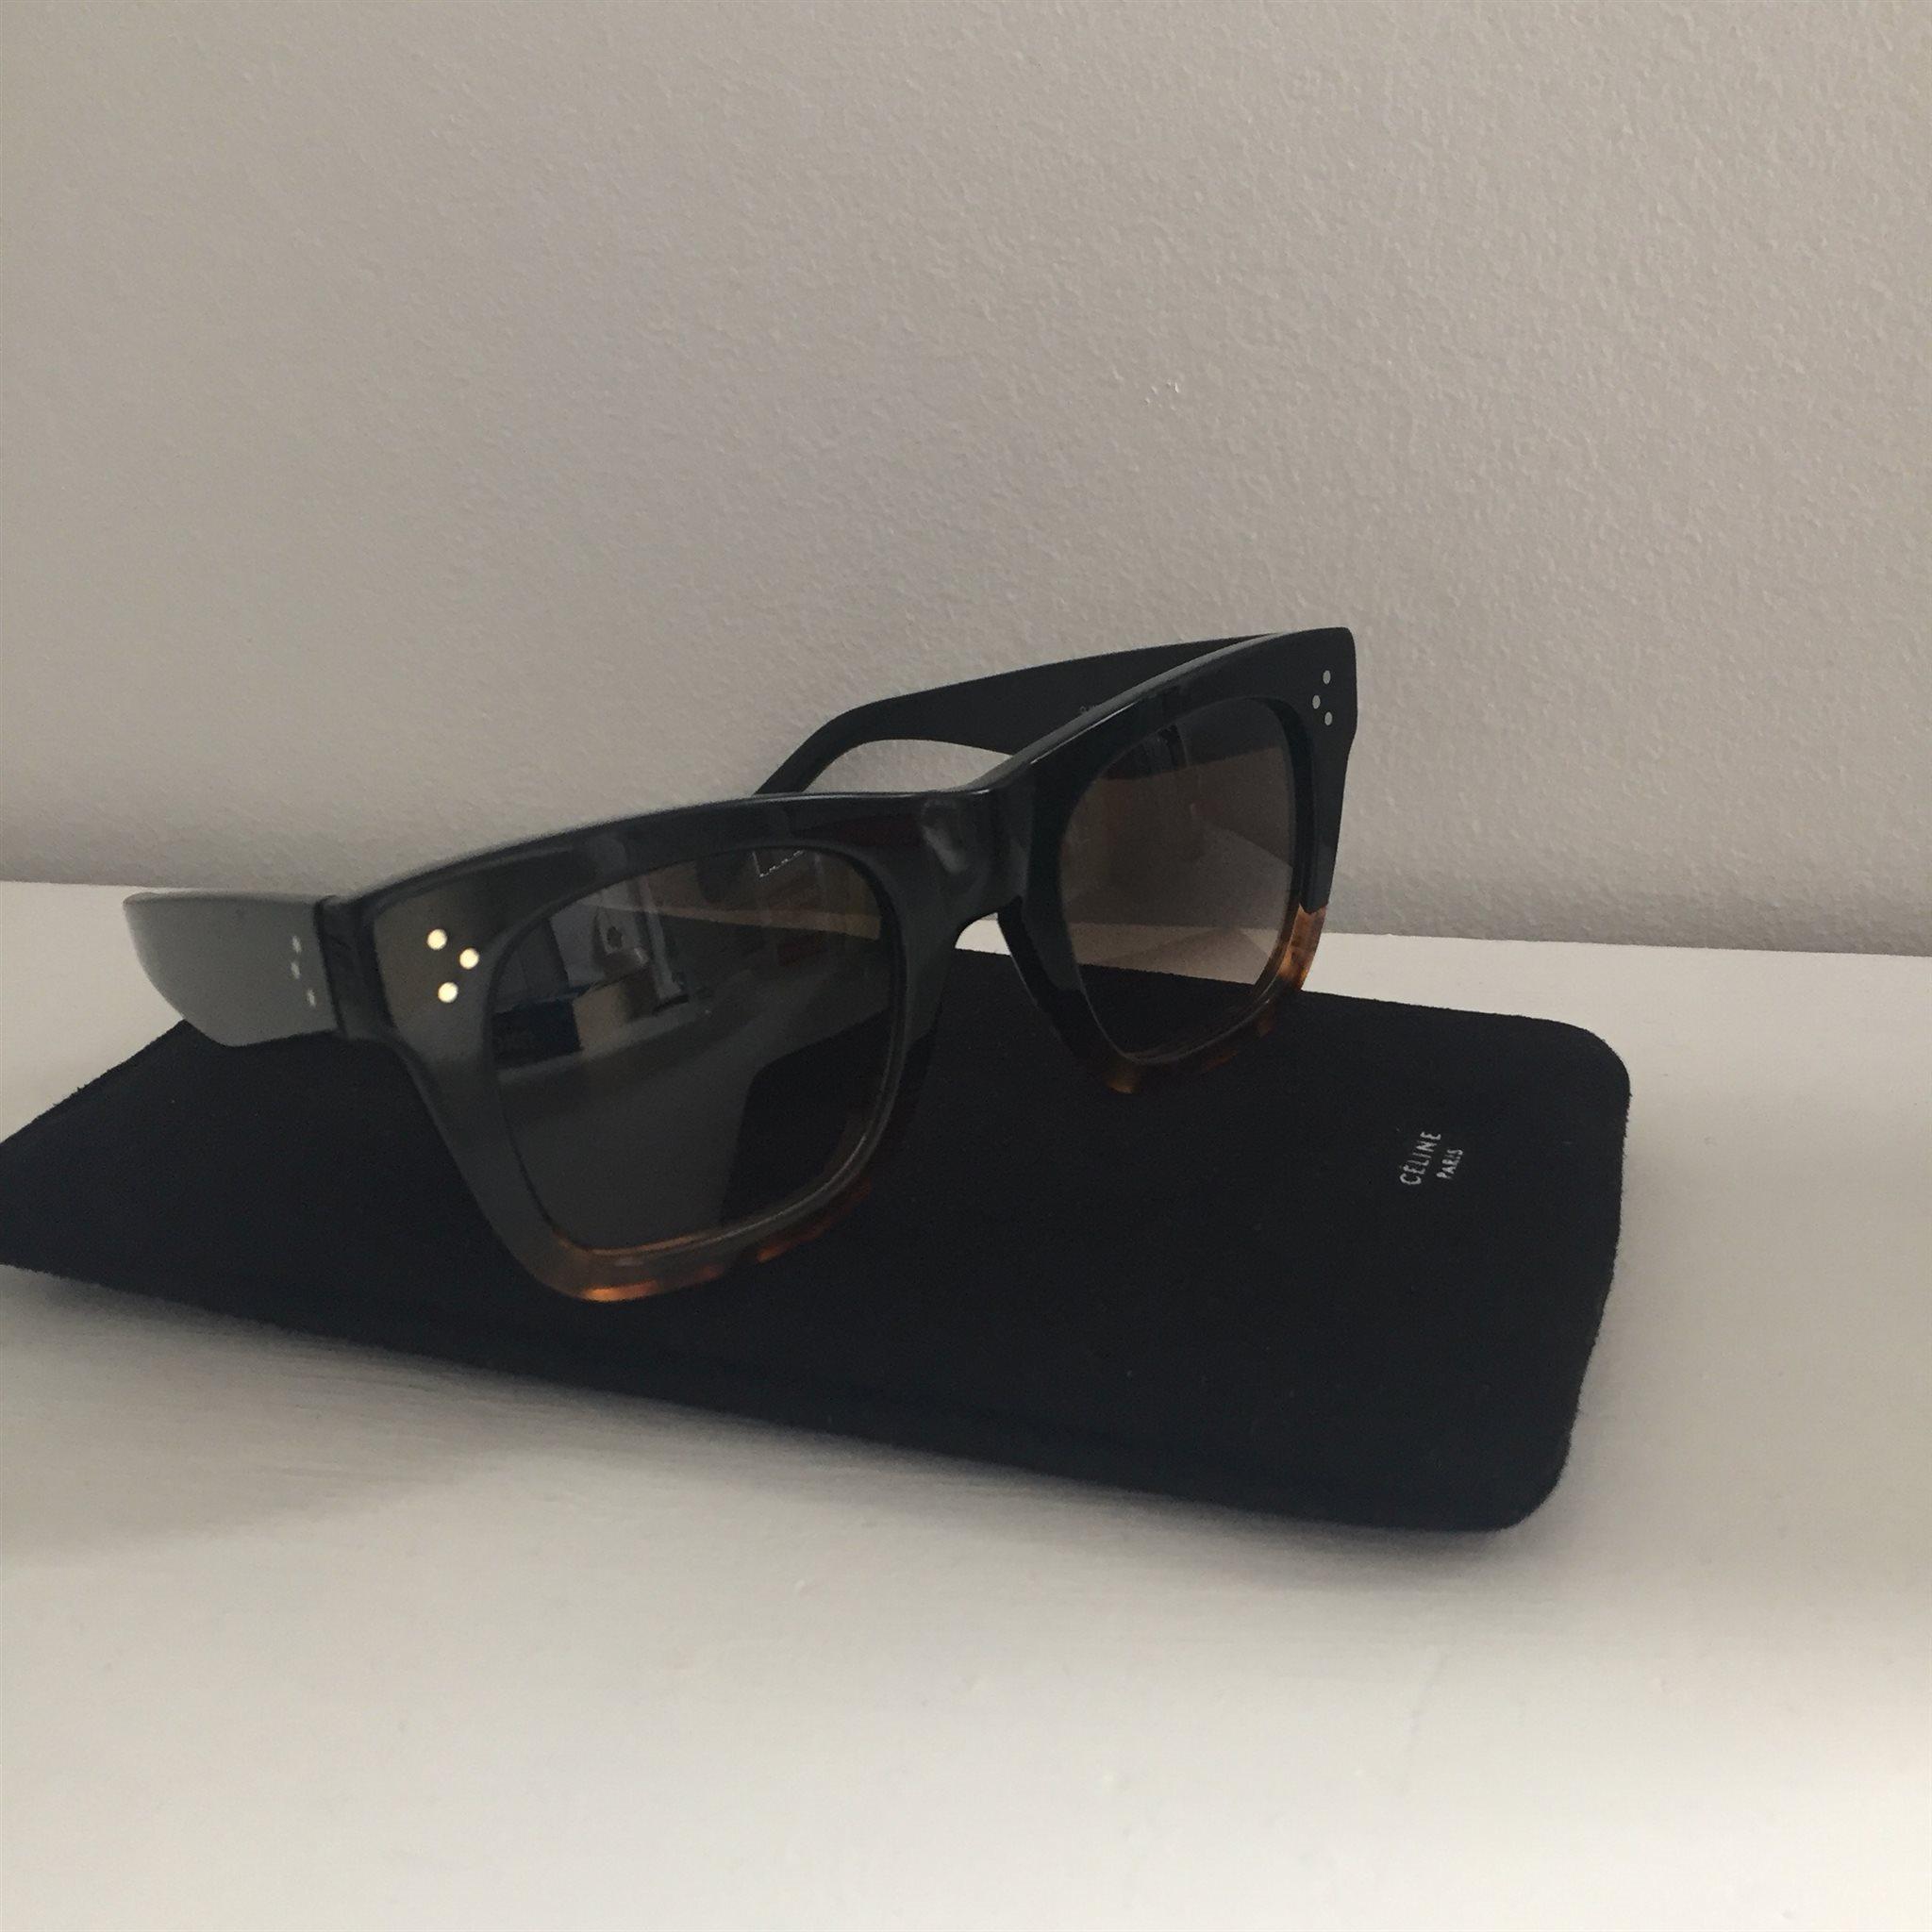 7d9ab5a10e4 Céline solglasögon (334596948) ᐈ Köp på Tradera